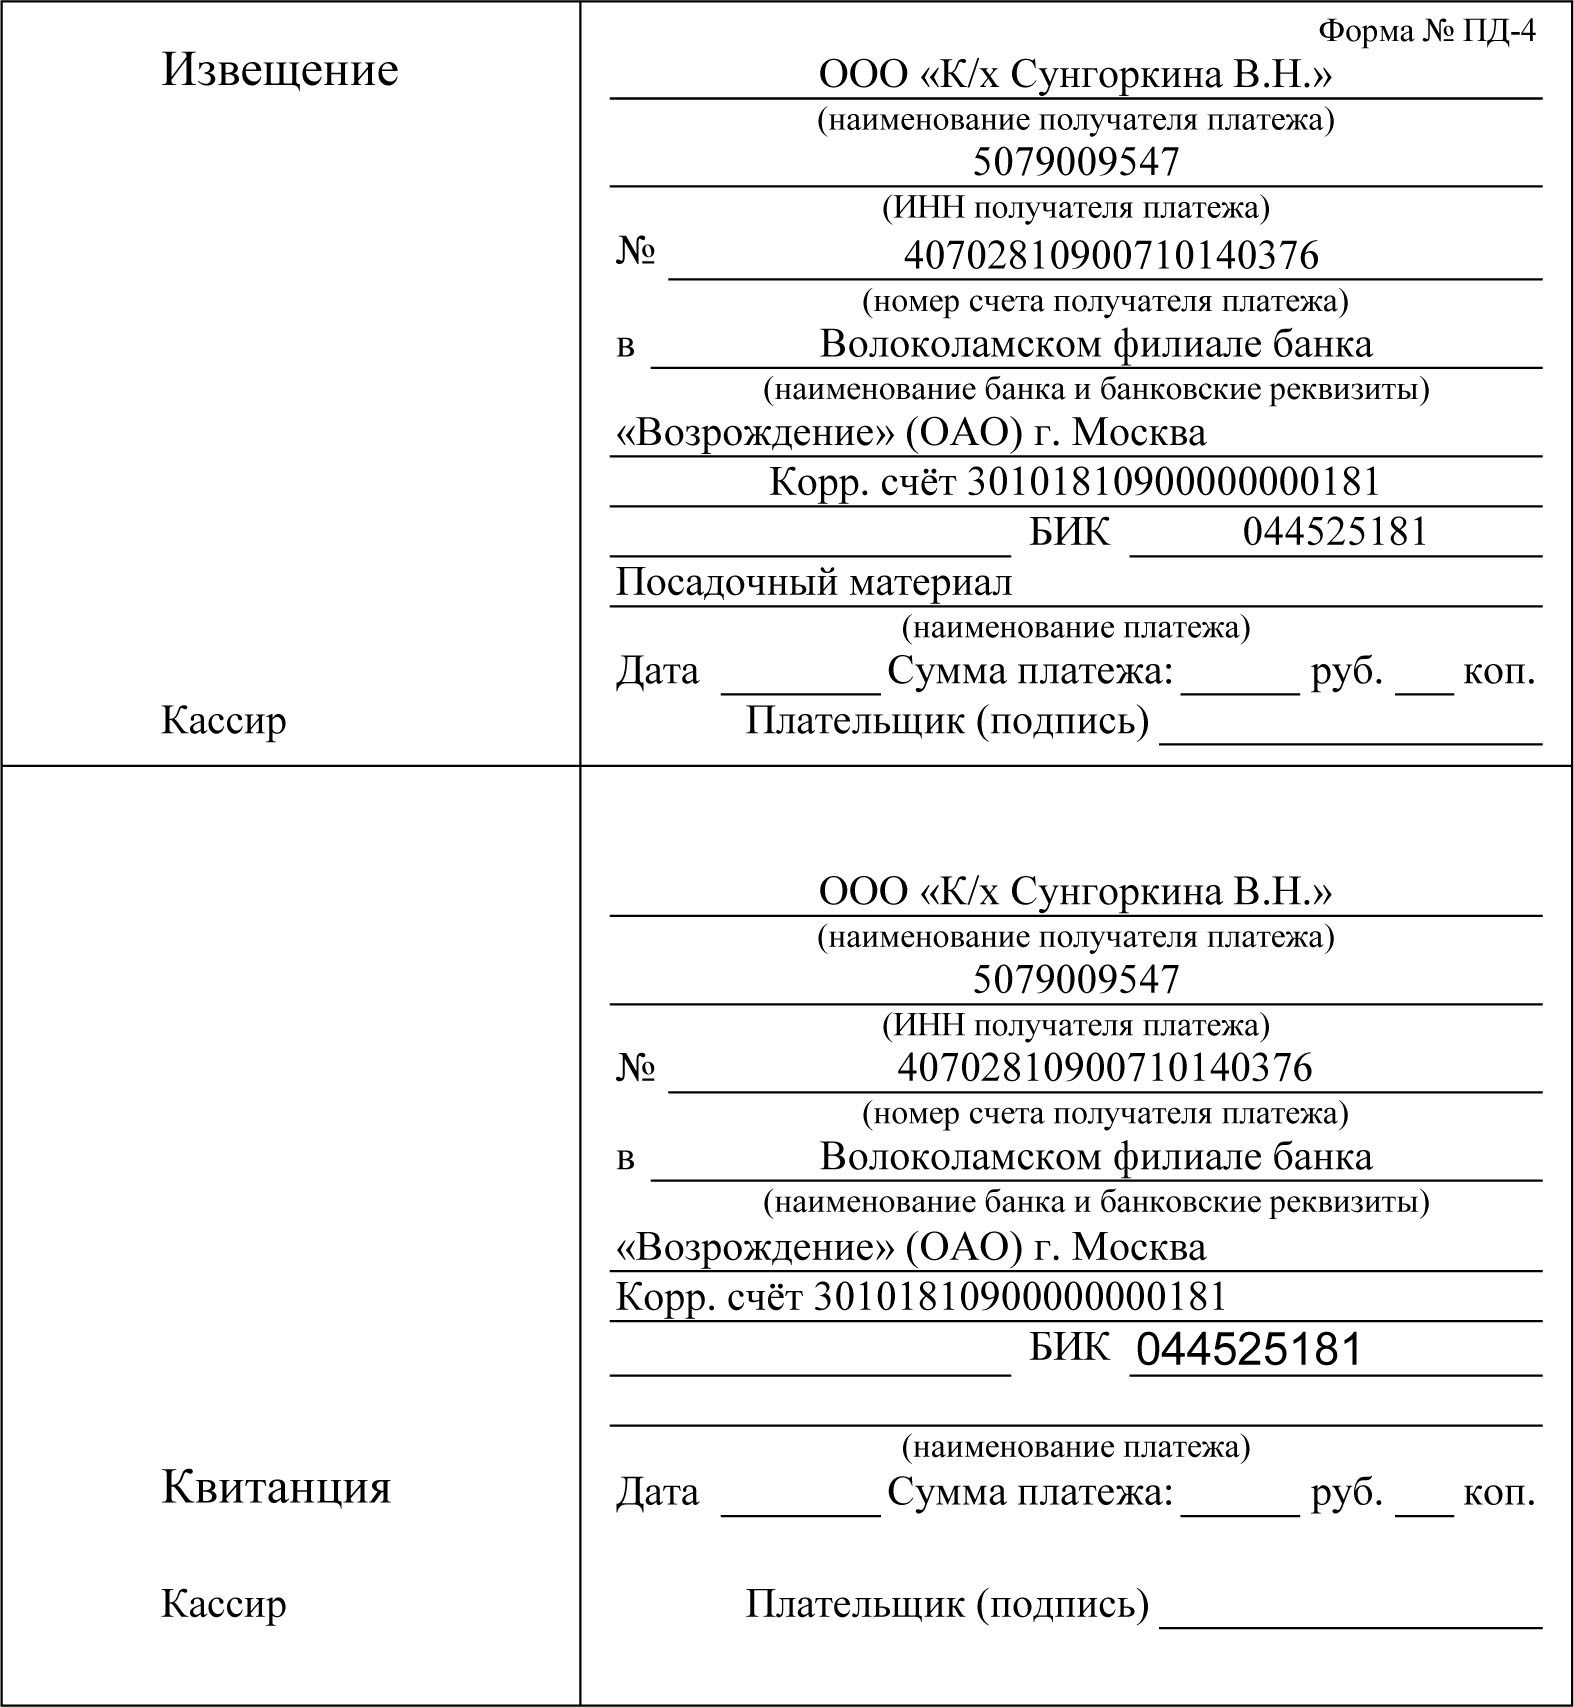 Free Antivirus www.avast.ruСкачать антивирус аваст демо версия. .